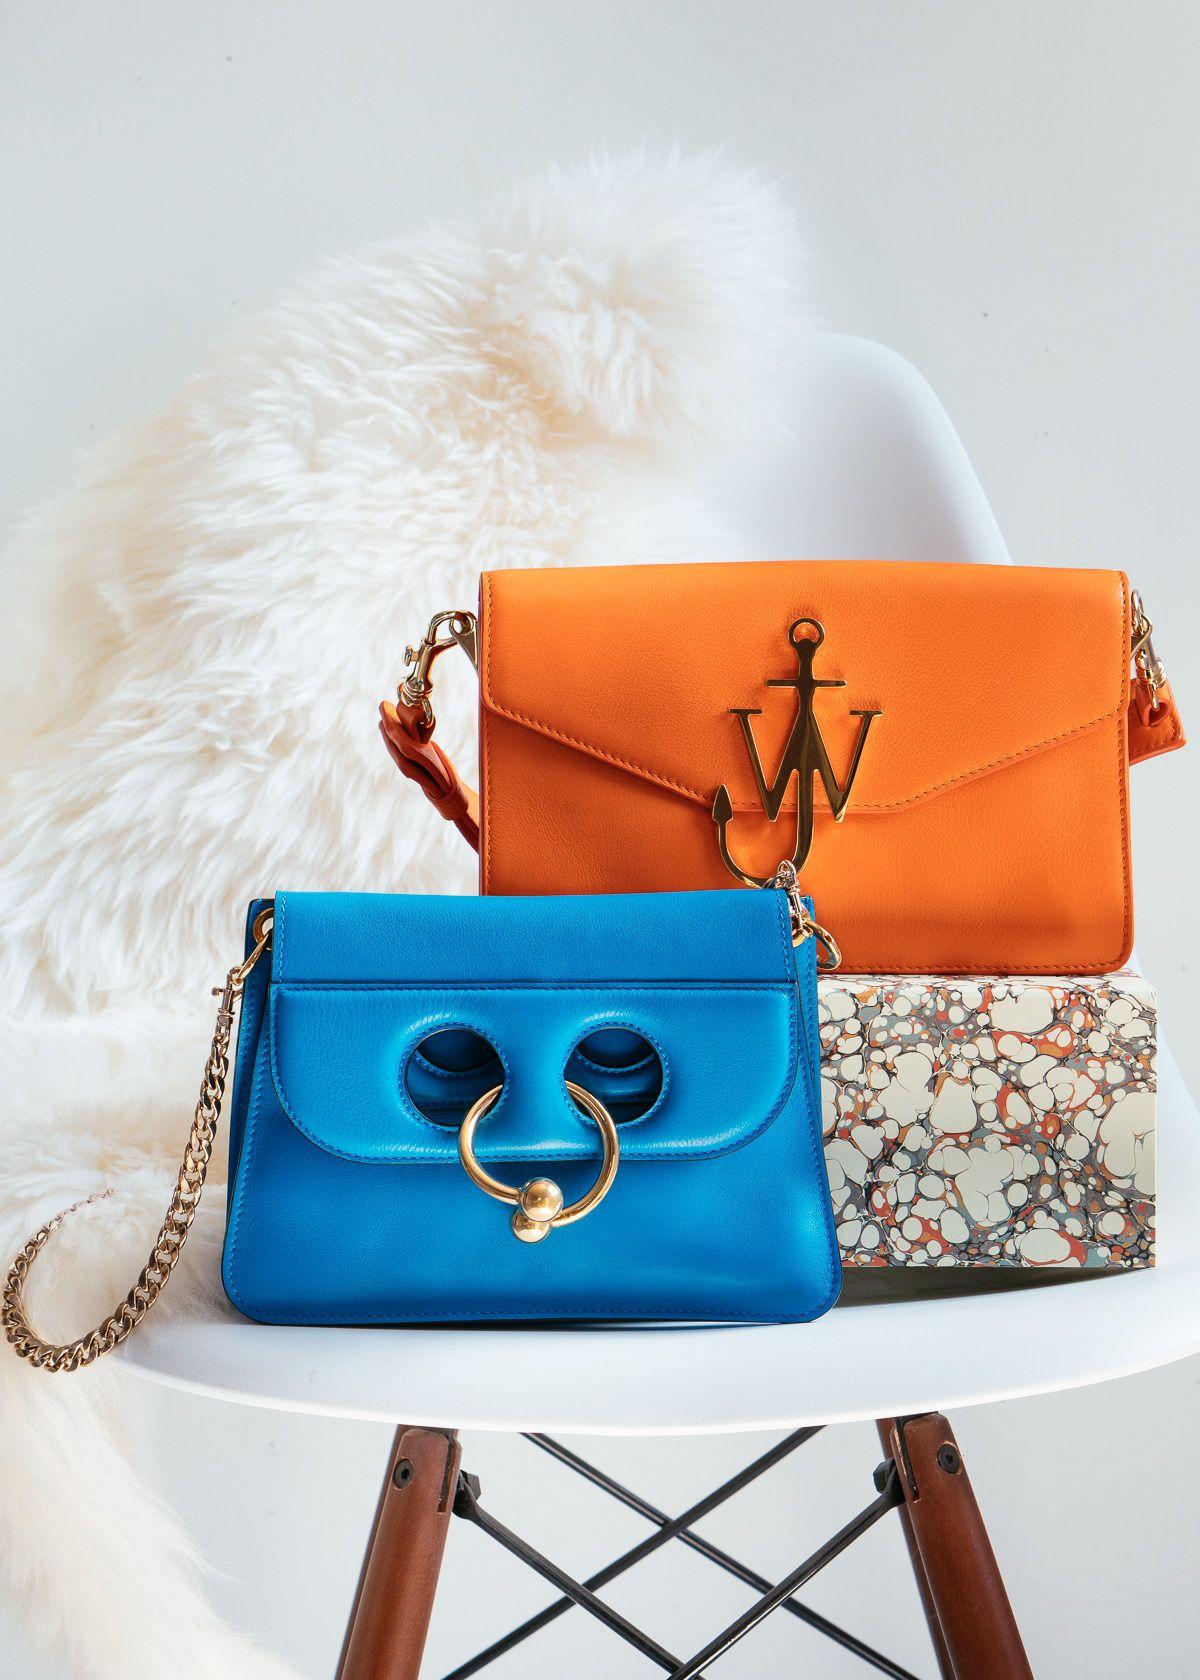 2c6de62ff58c Gucci's Bamboo Classic Frame Top Handle Bag | Bags | Bags, Gucci bamboo,  Gucci bamboo bag